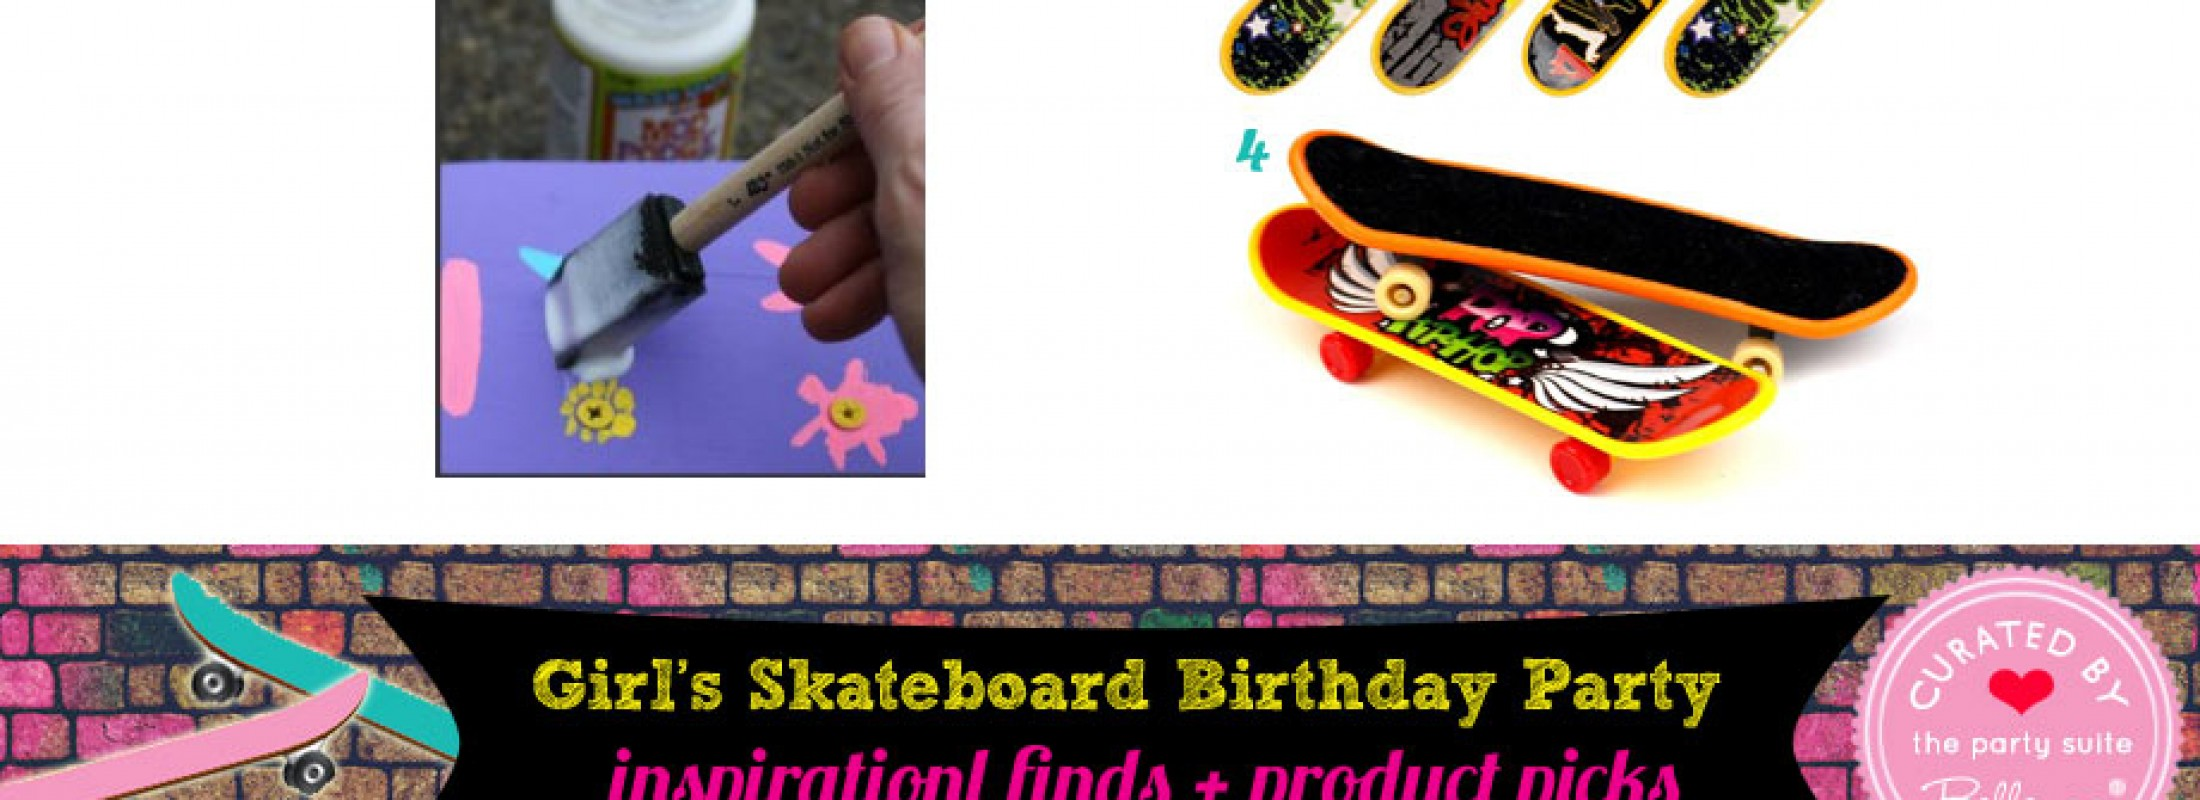 Skateboard Birthday Party Ideas for a Pre-teen Girl!